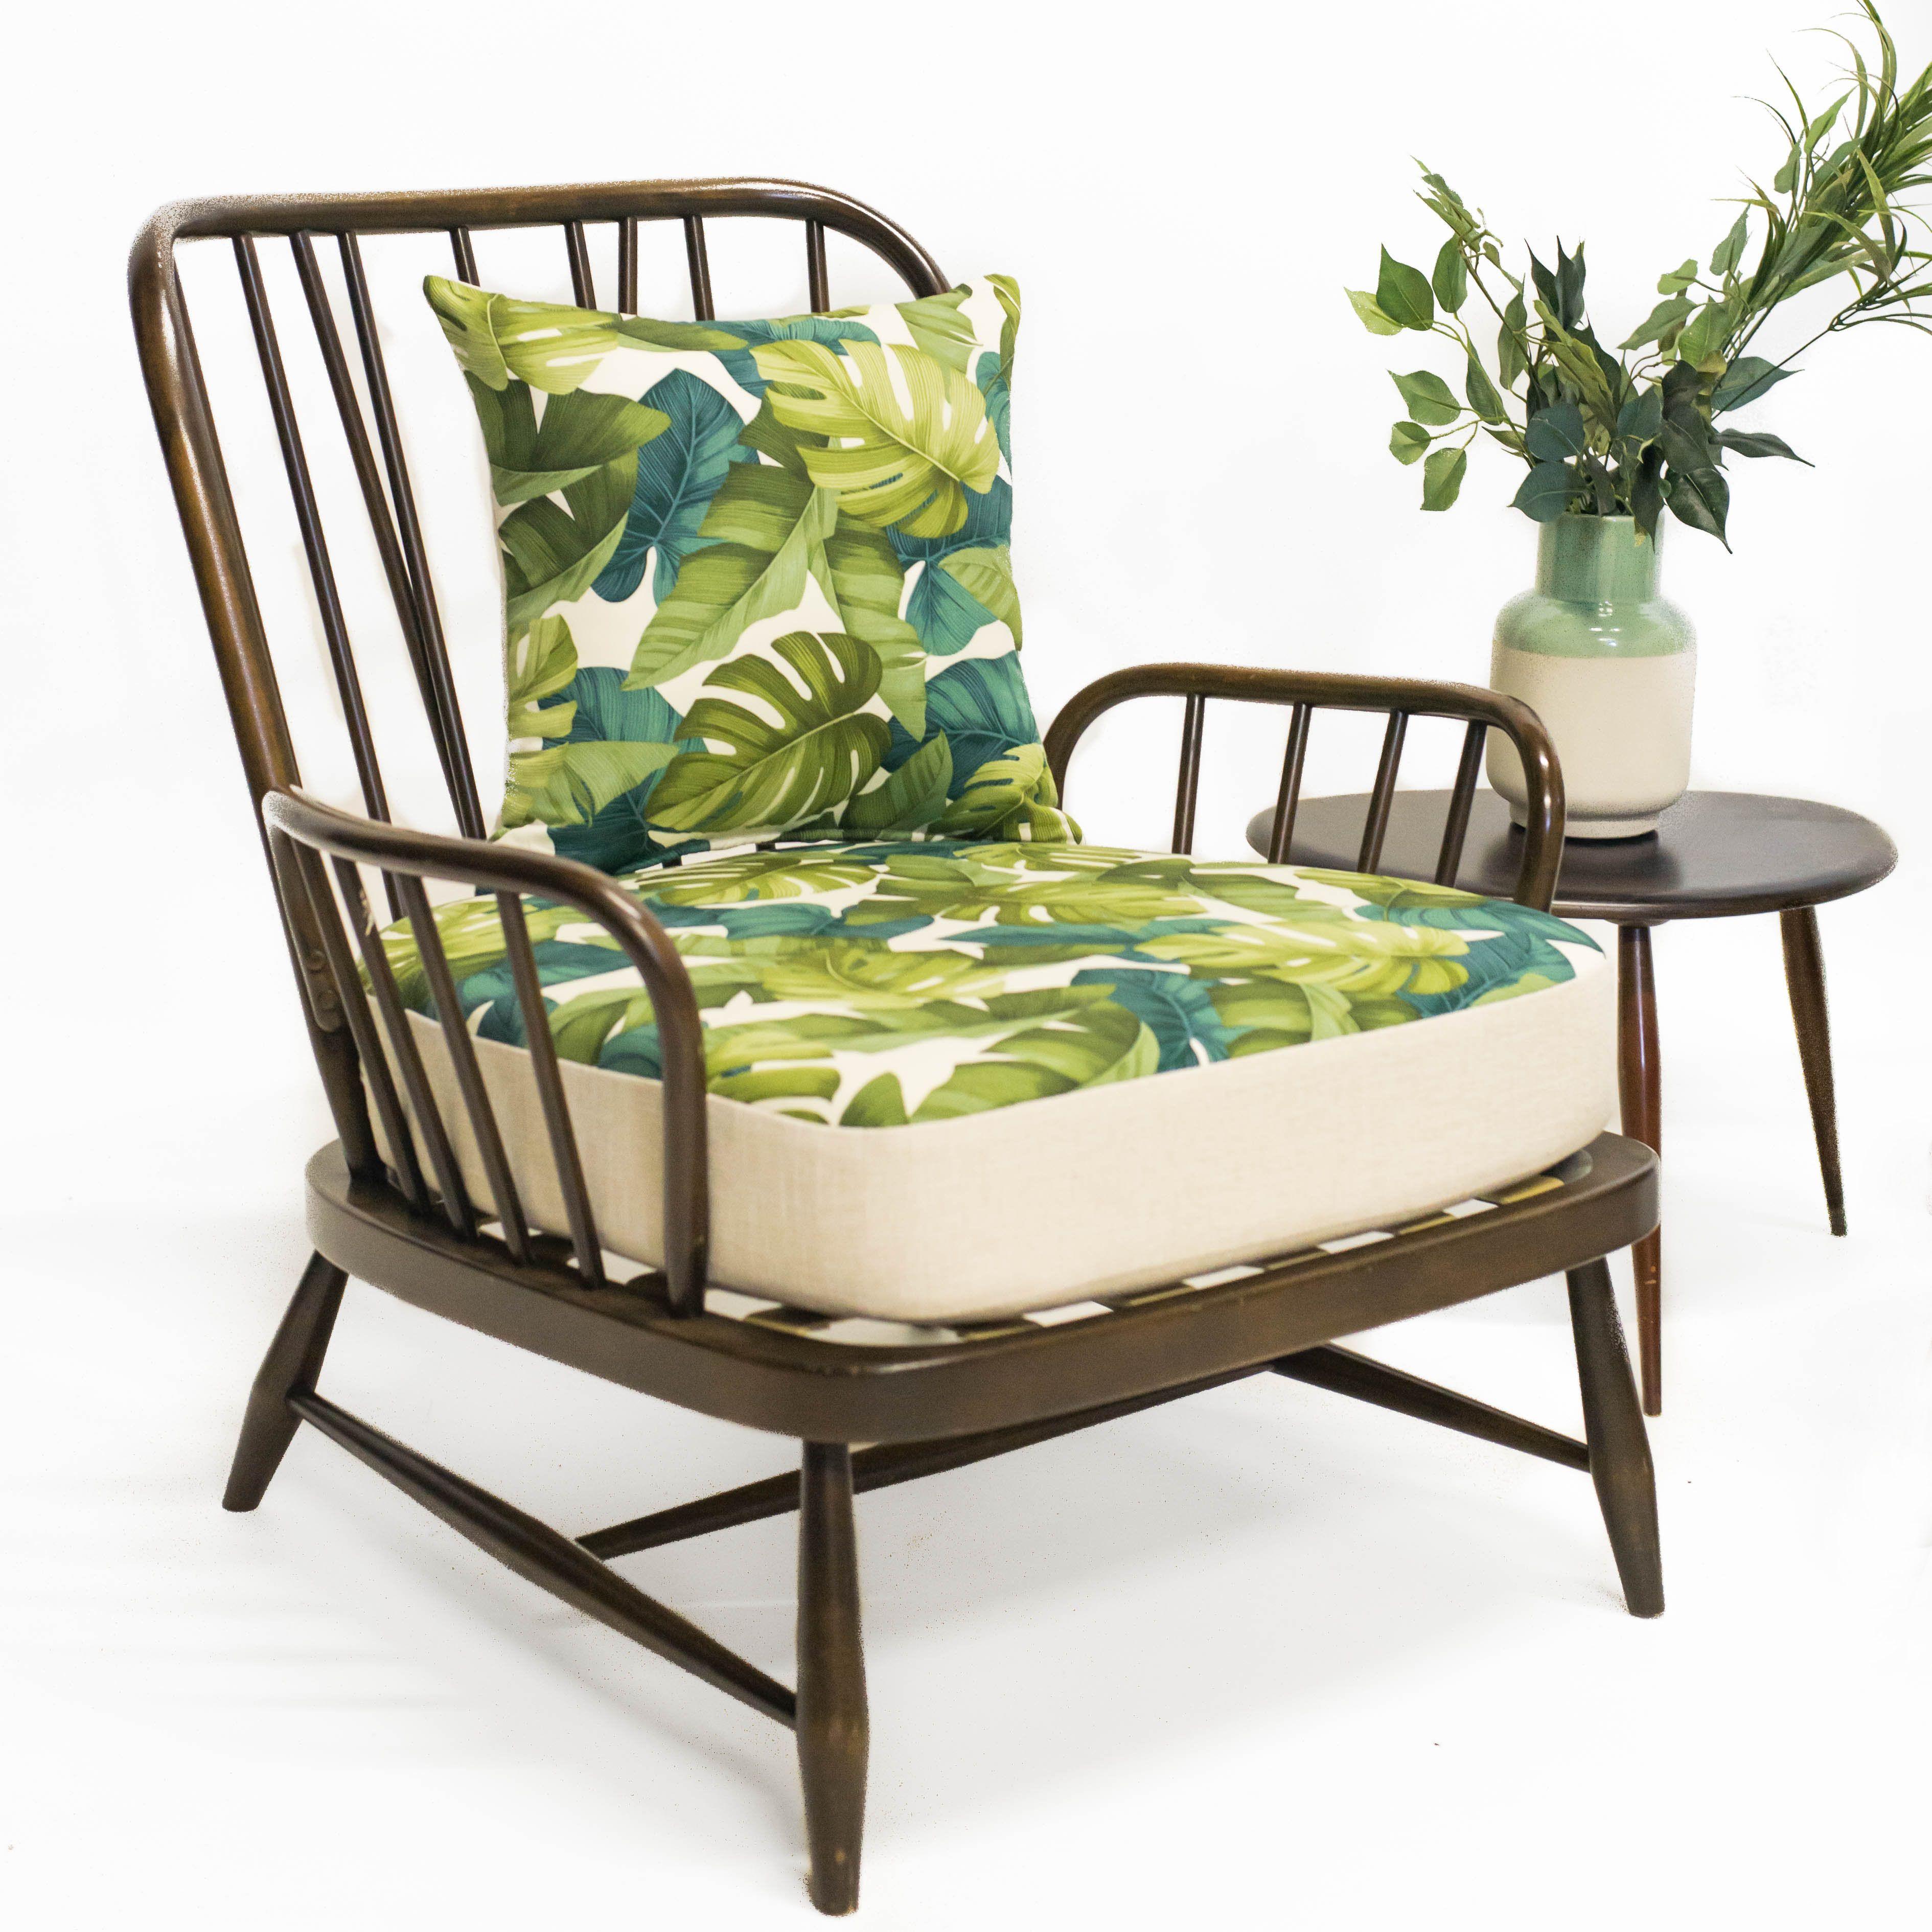 Ercol Jubilee Chair in Palm & Cream   Mood Board - Palmeras ...